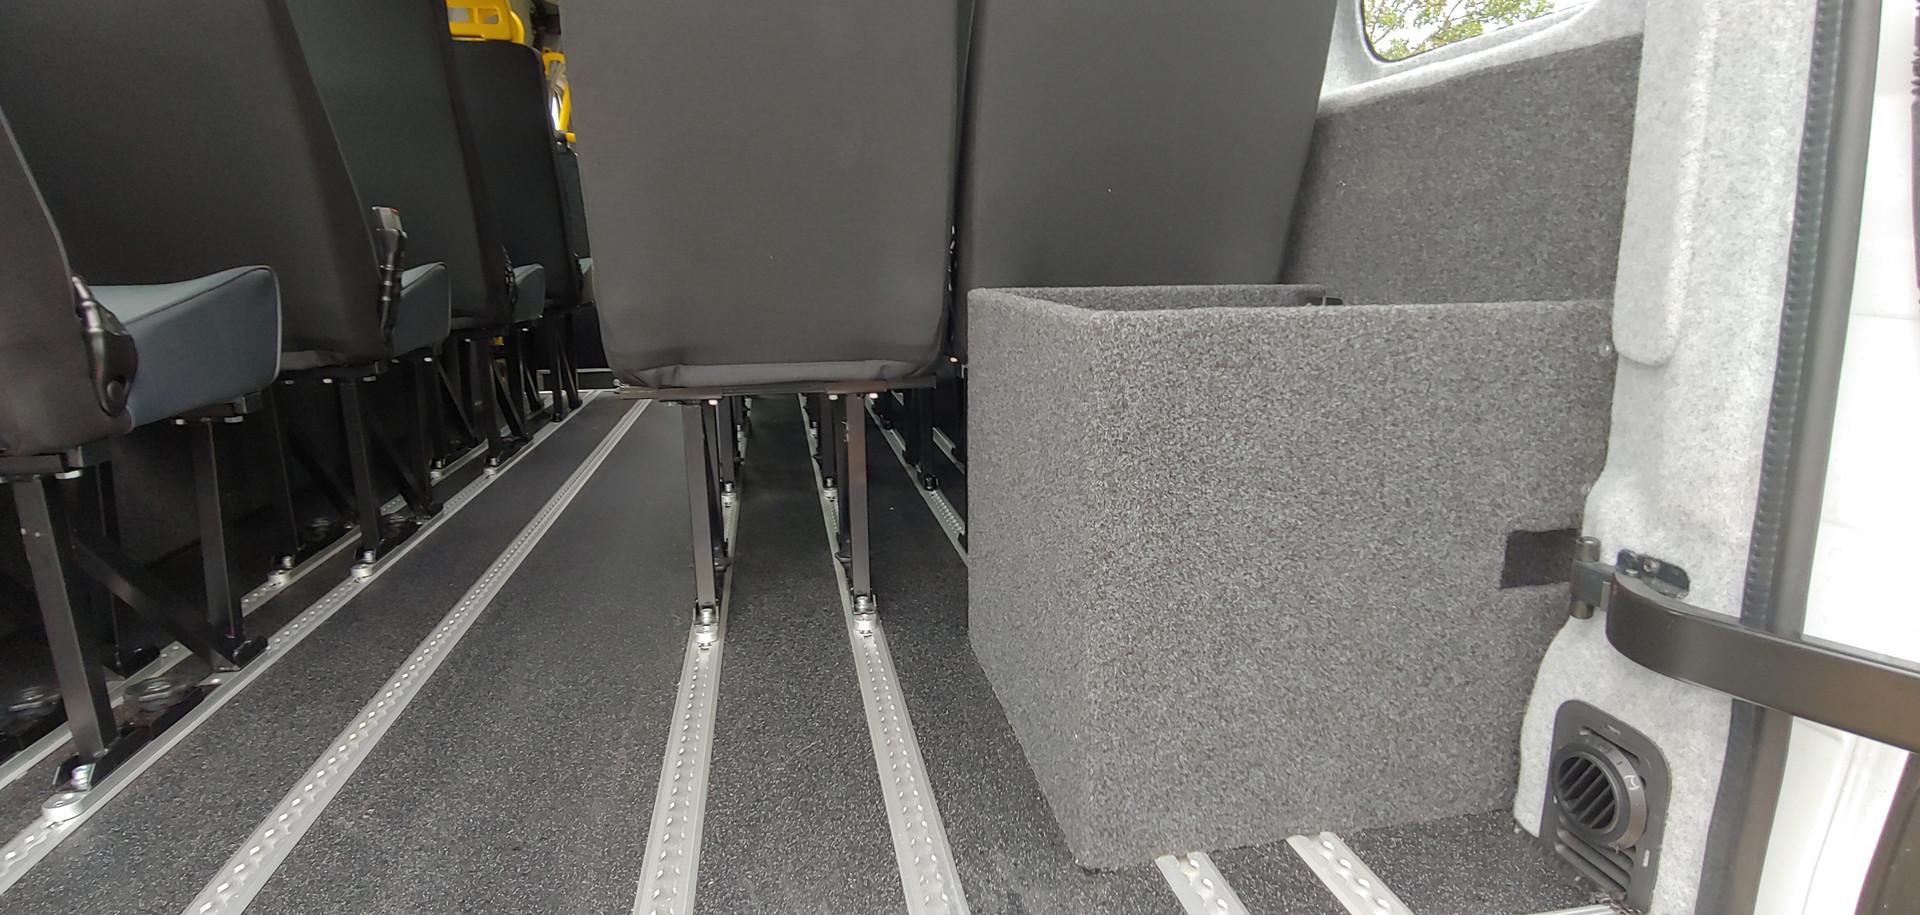 Seats and storage